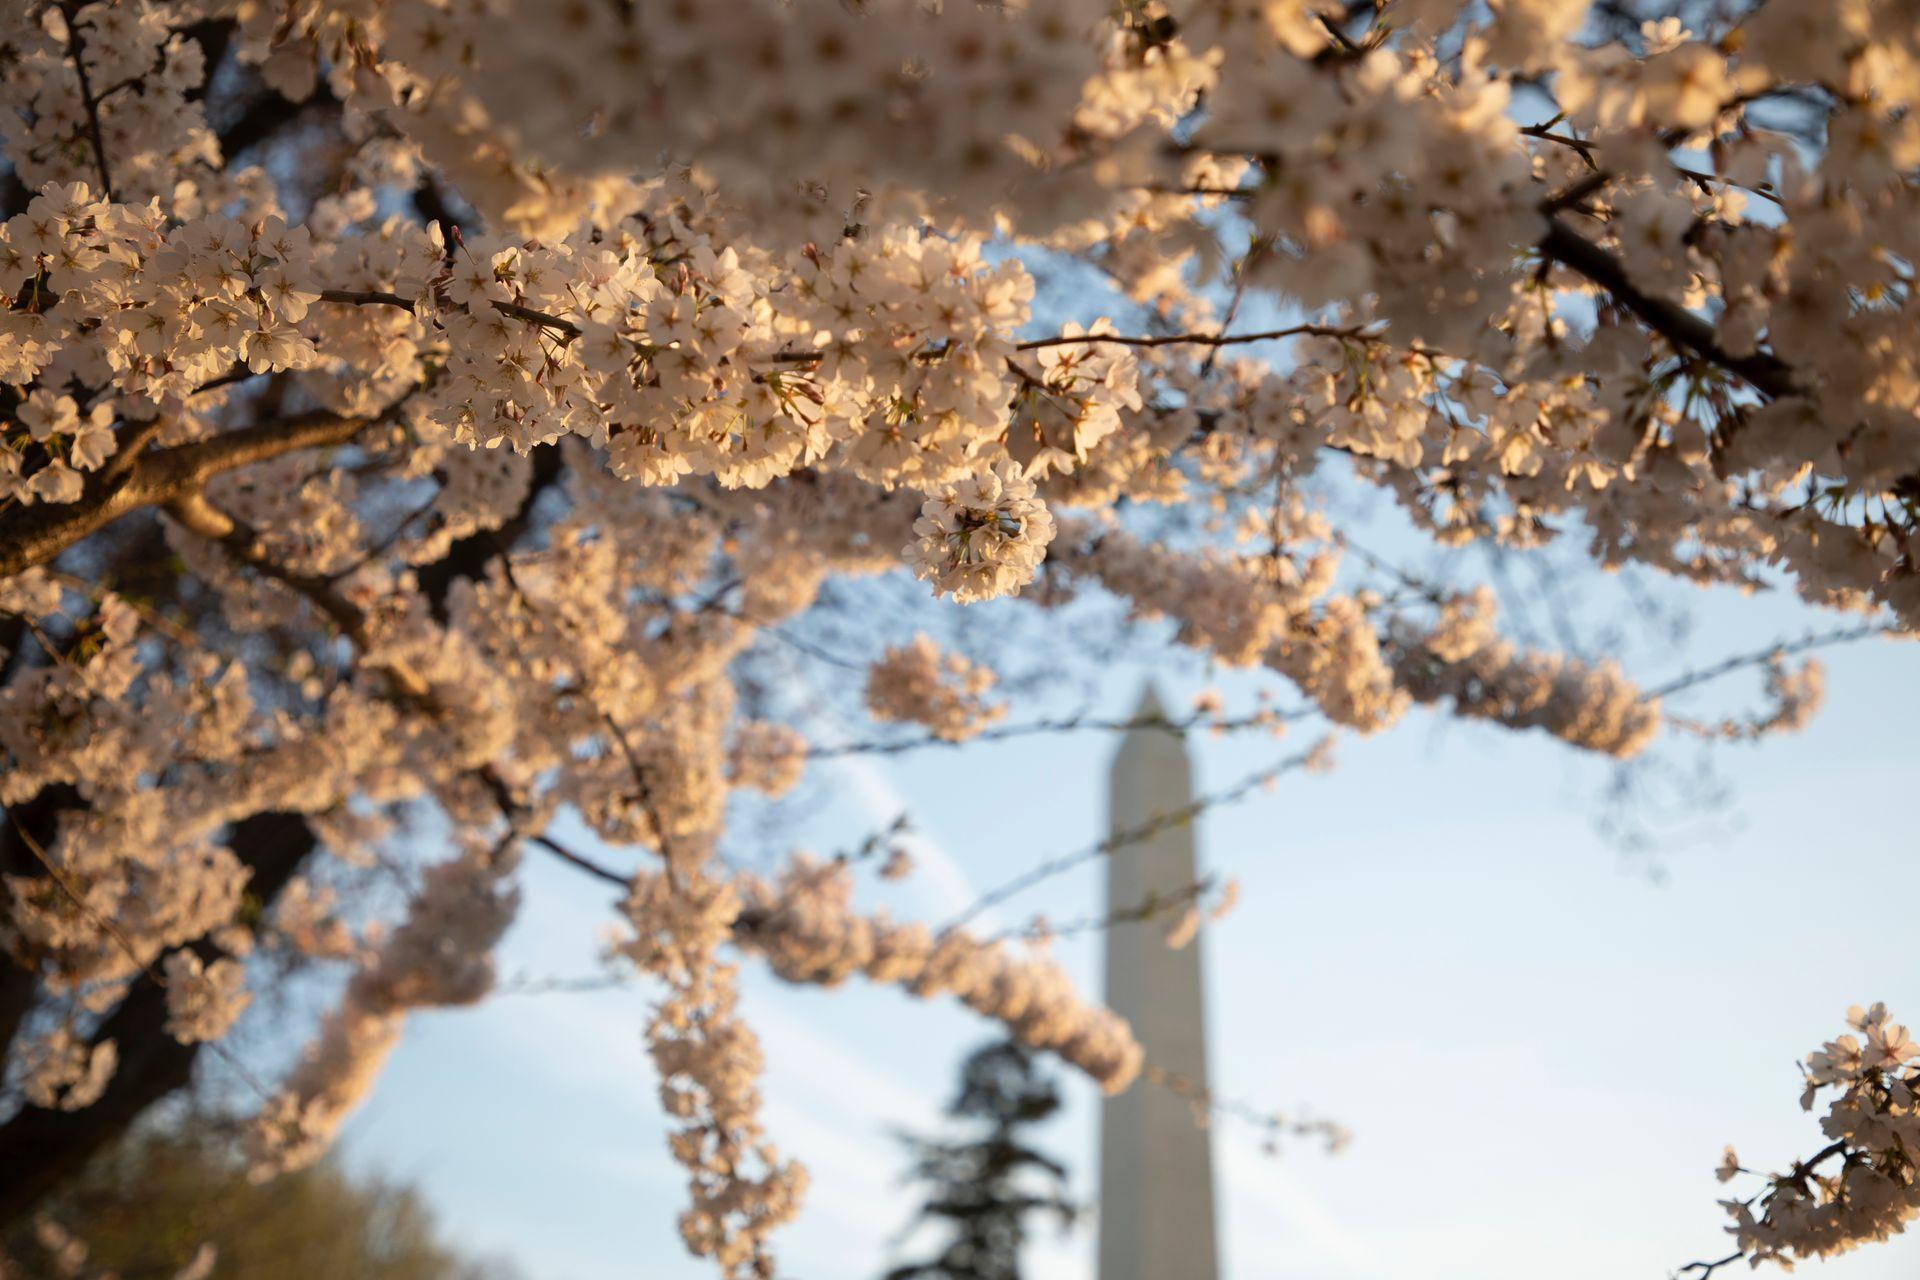 Cherry Blossoms Are In Full Bloom In Washington D C Cherry Blossom Festival Flowering Cherry Tree Cherry Blossom